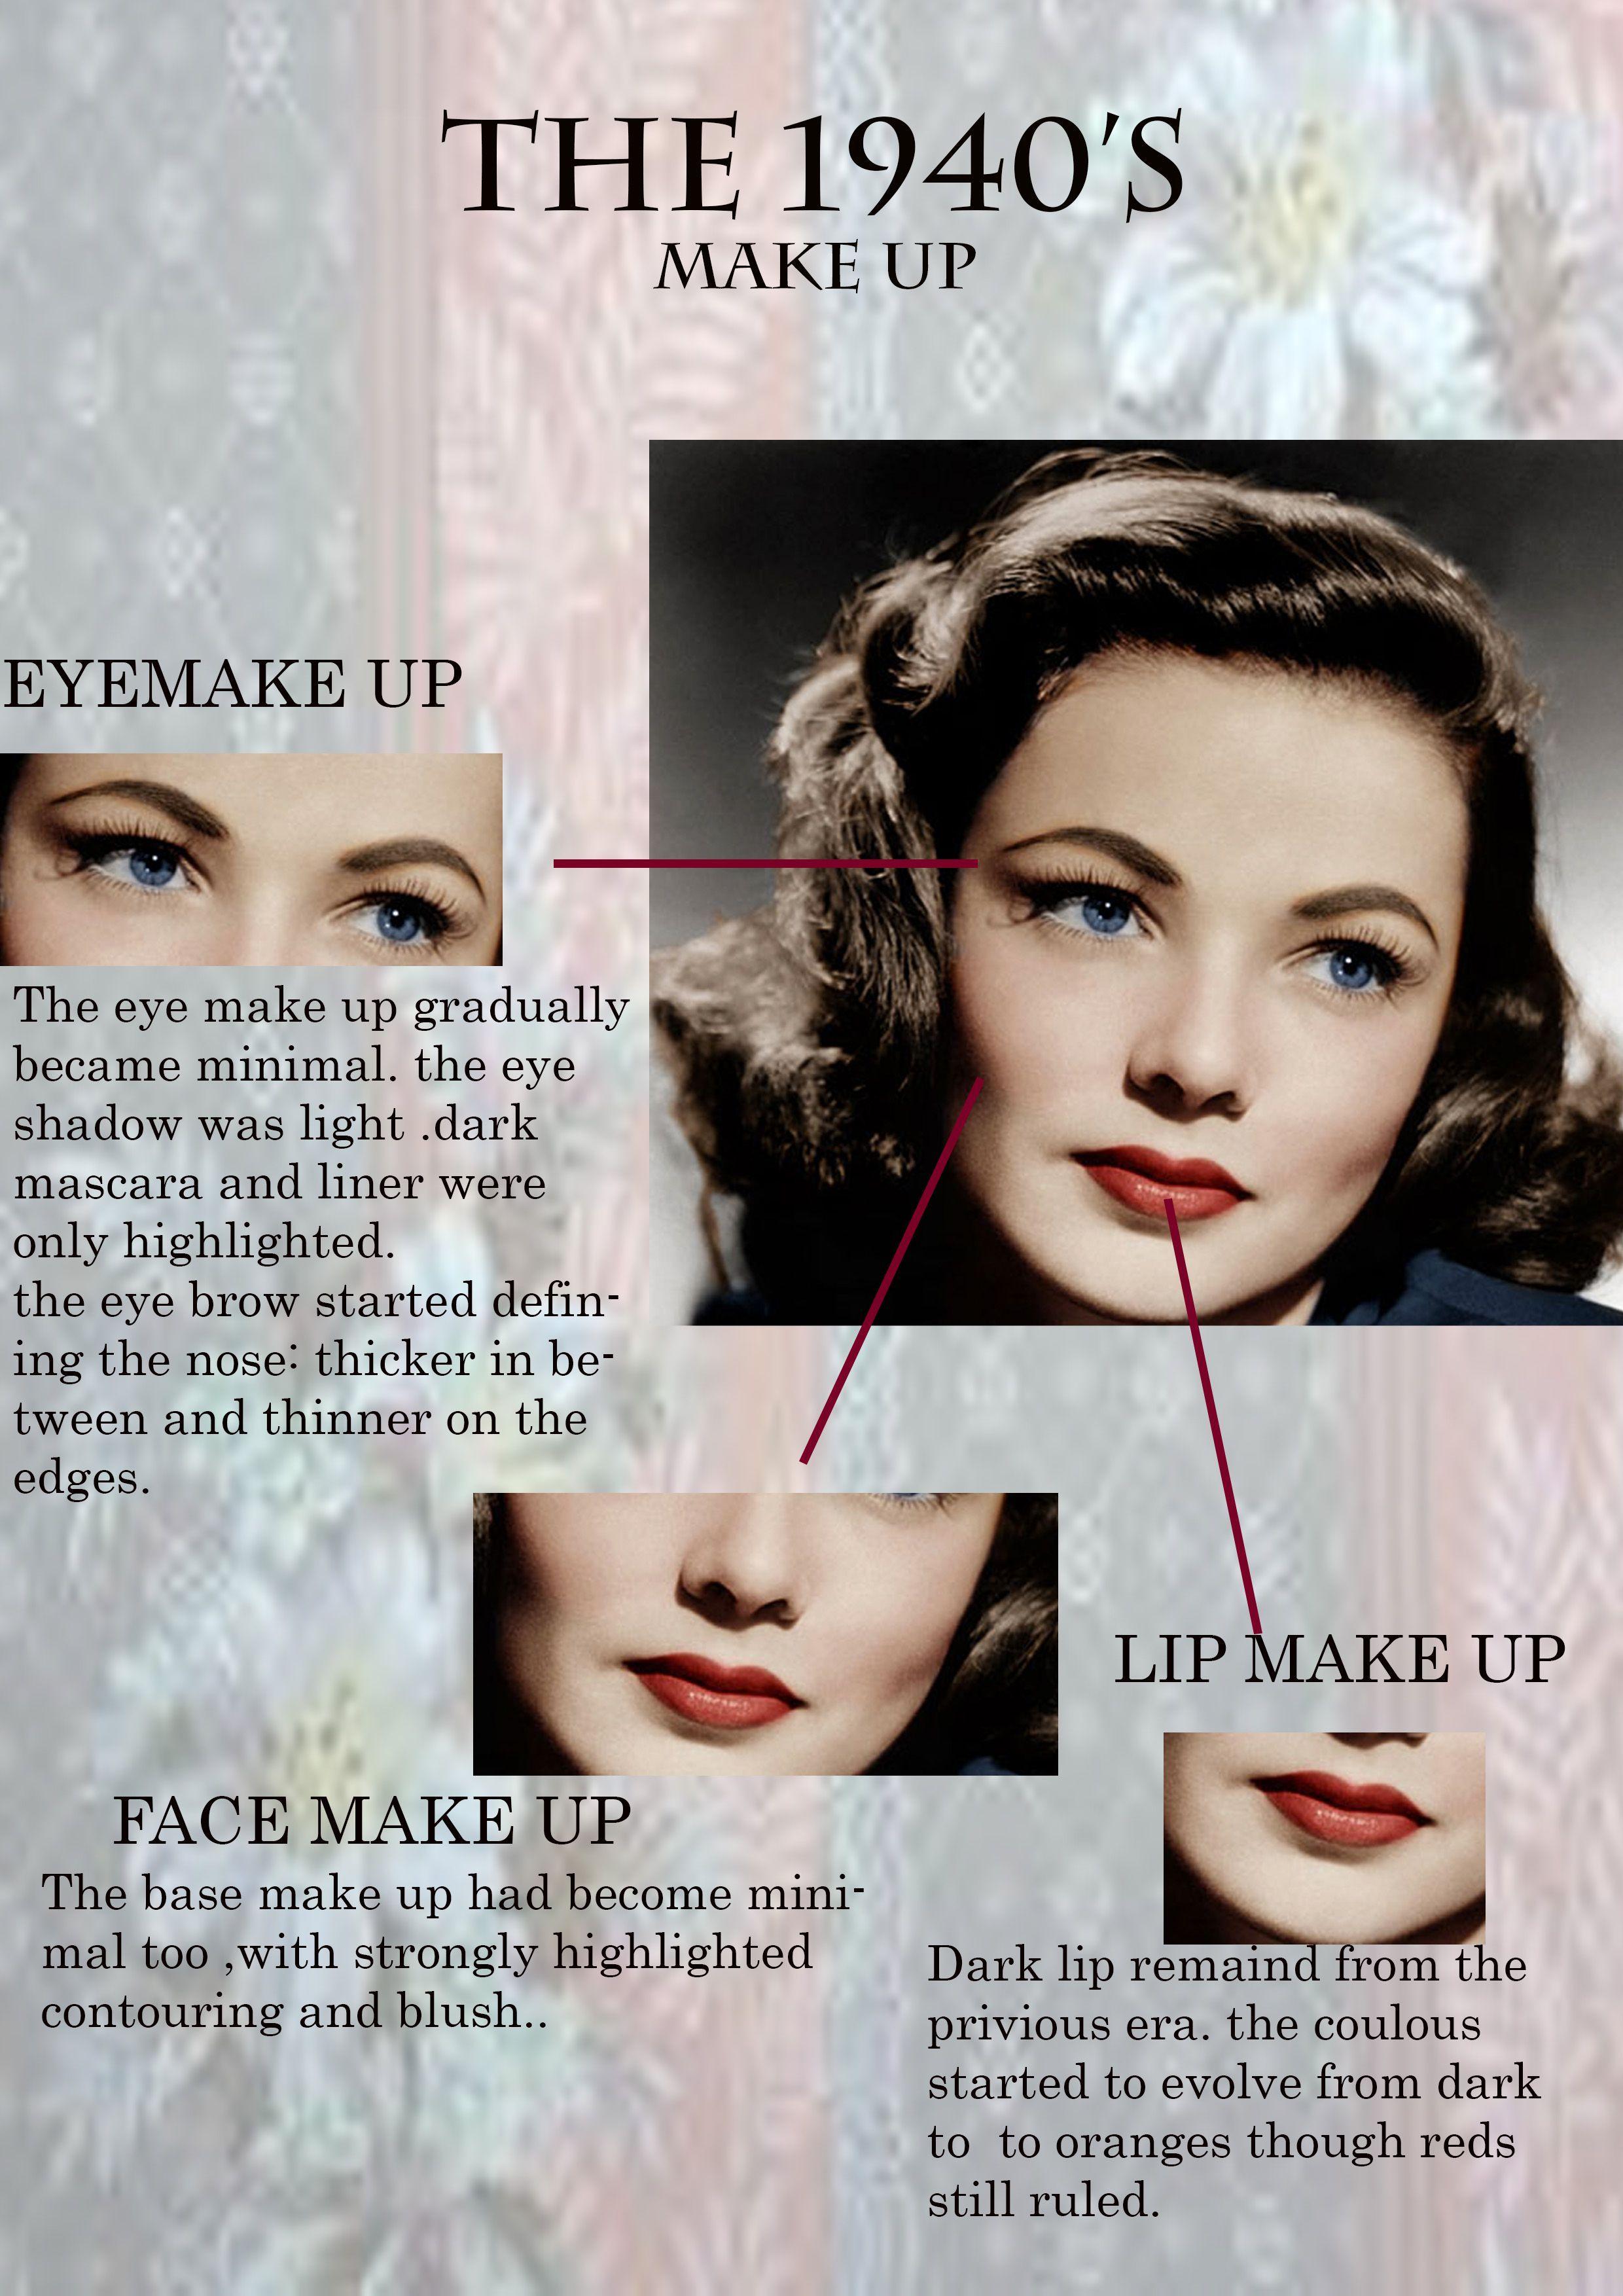 A Breakdown Of The More Minimal Makeup Look Board 7 1940s In - 1940-makeup